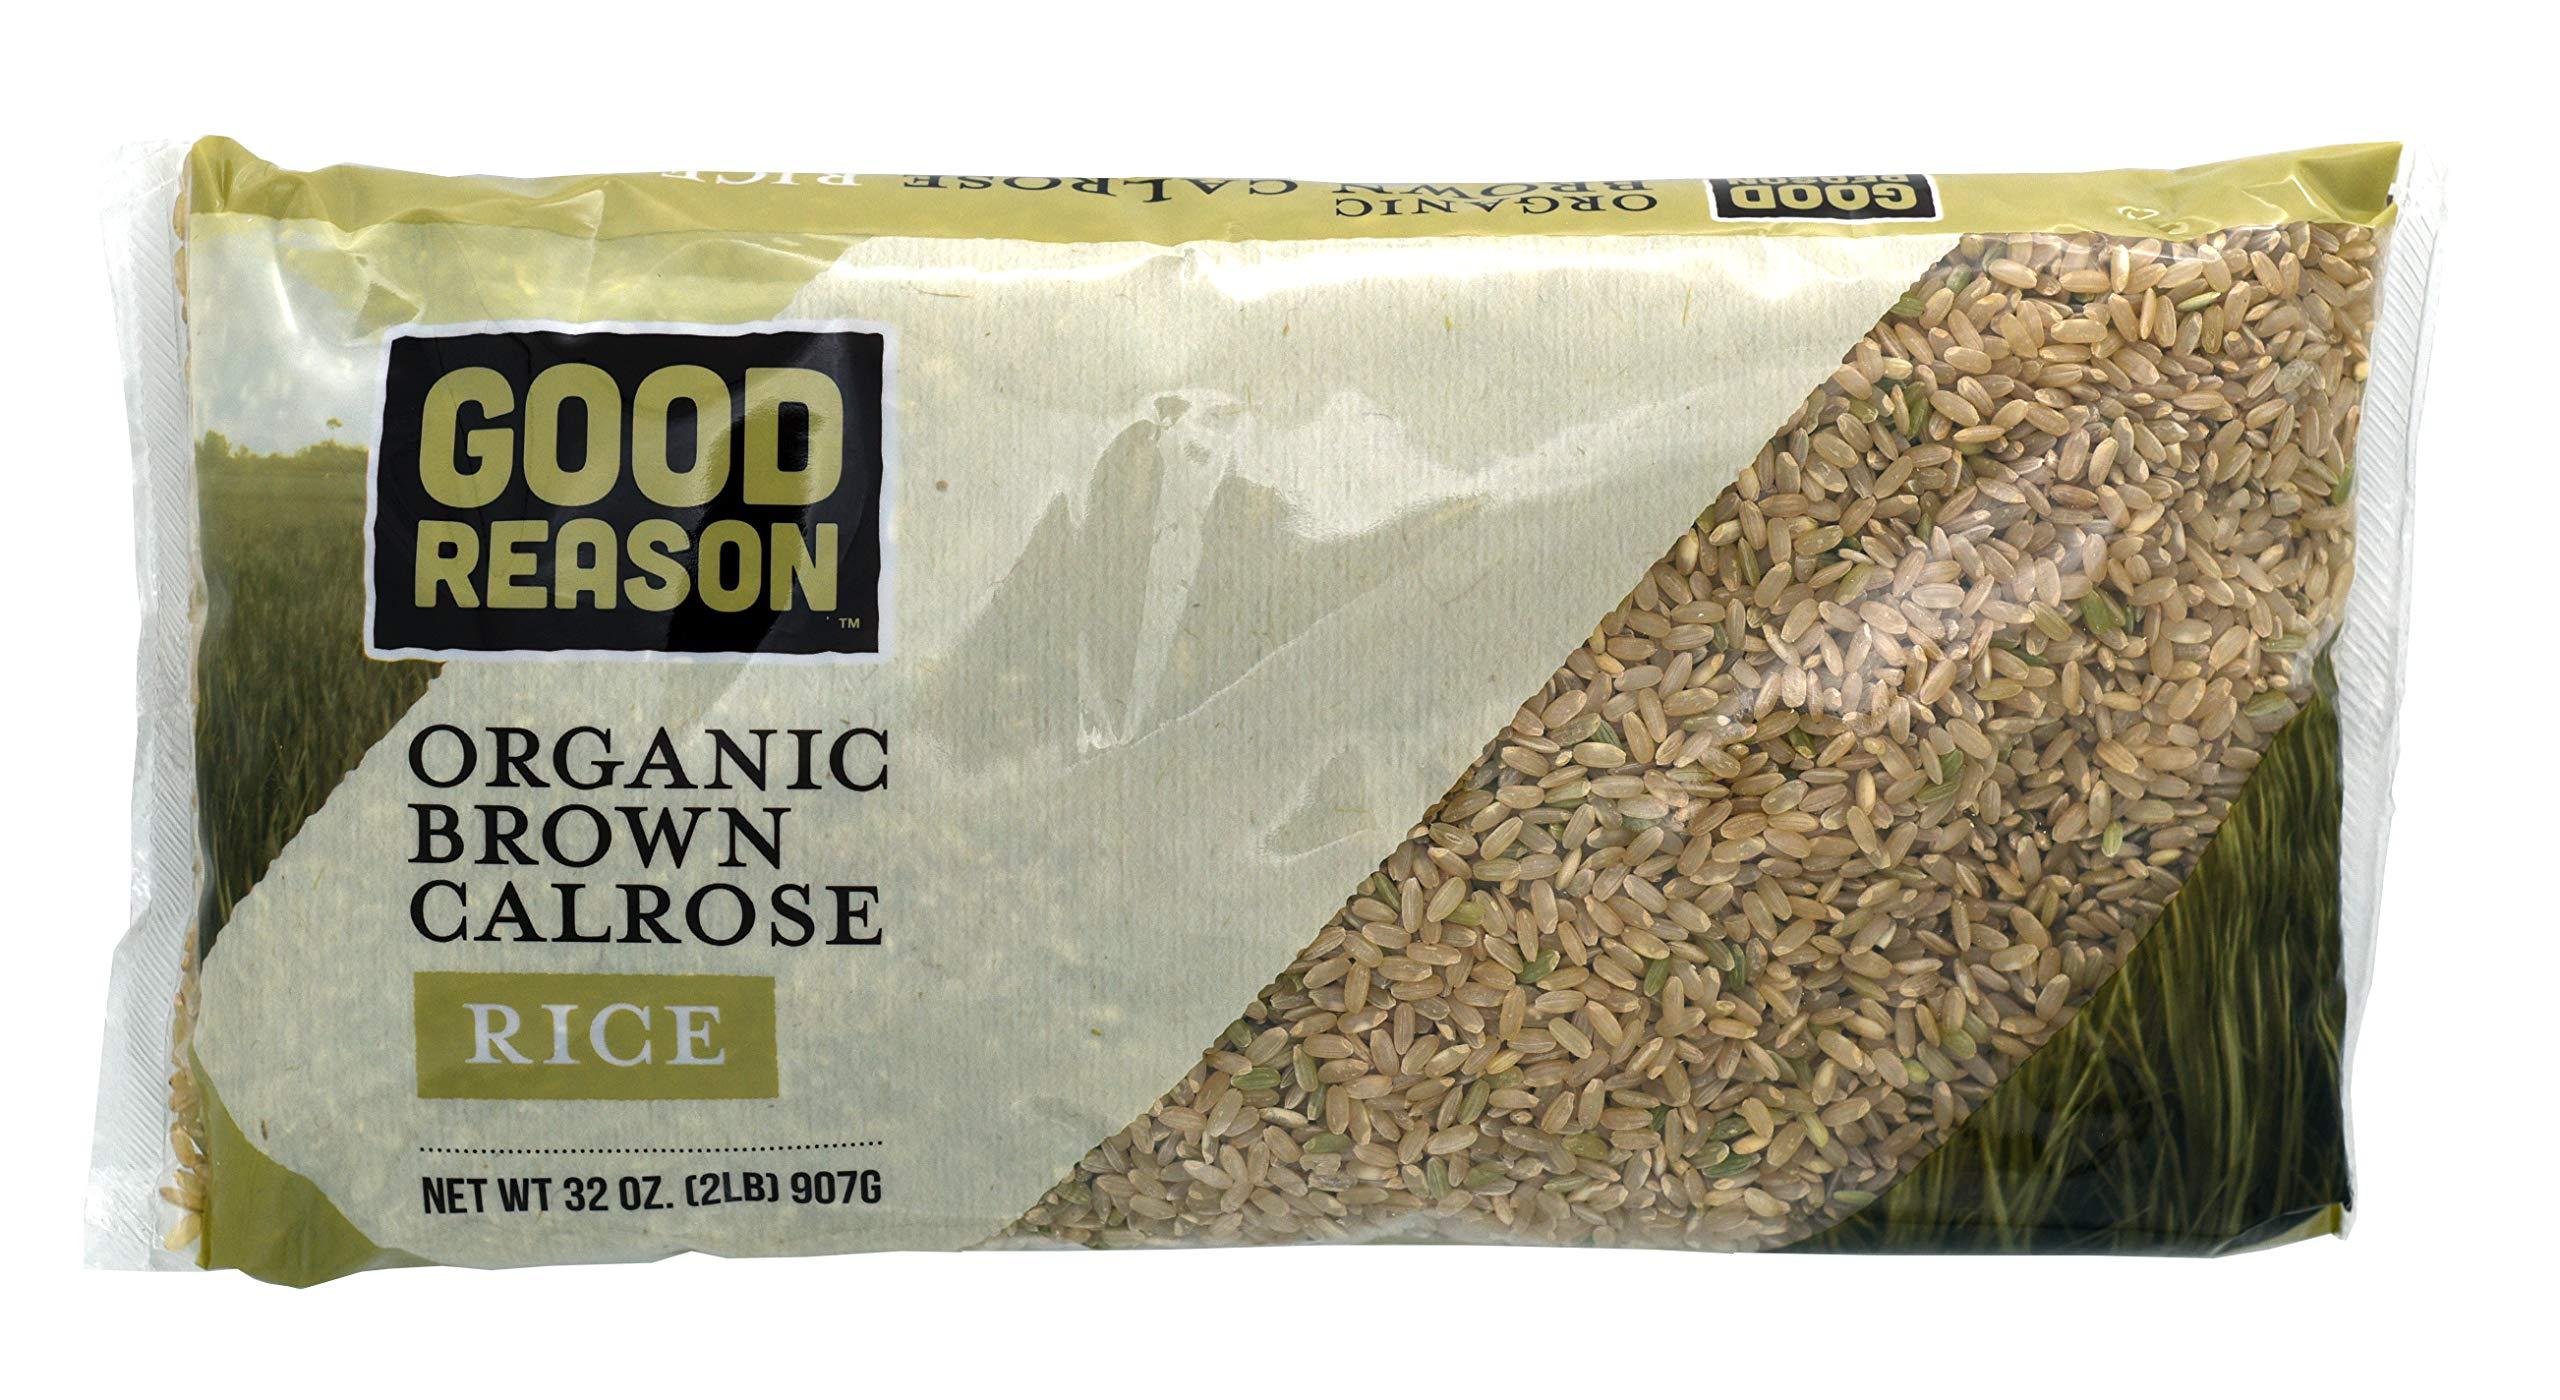 Good Reason Organic Brown Calrose Rice, 2 Lb